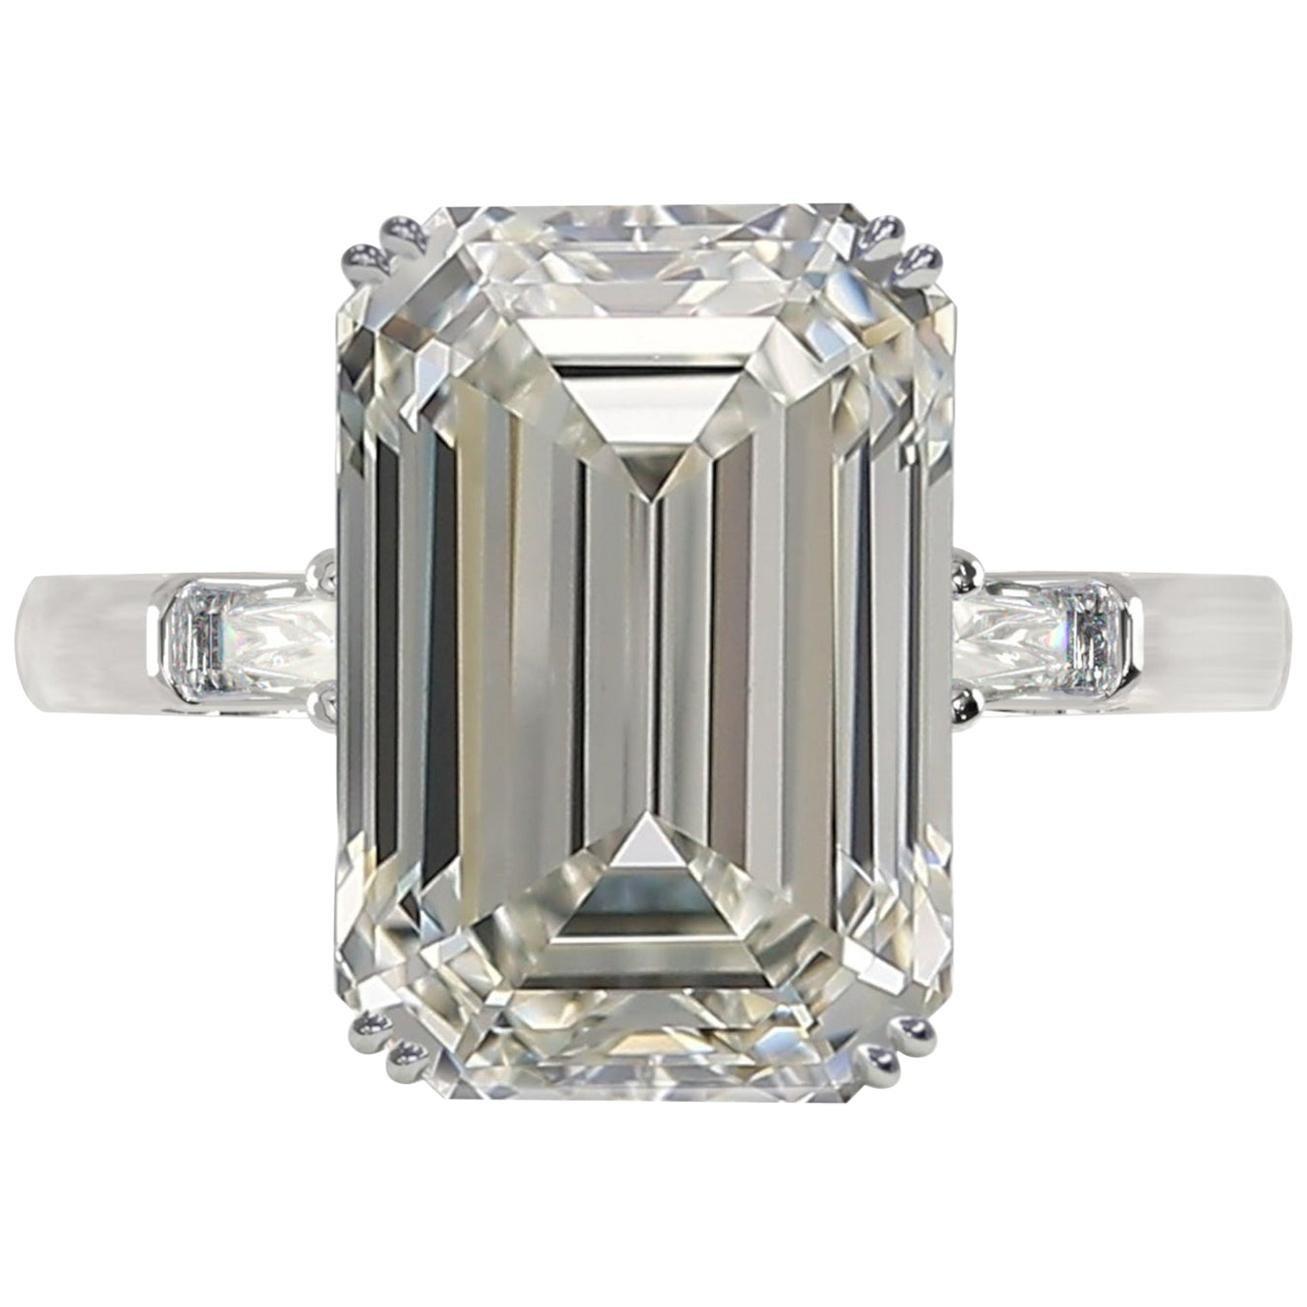 GIA Certified 3 Carat D VVS1 Emerald Cut Diamond White Gold Ring